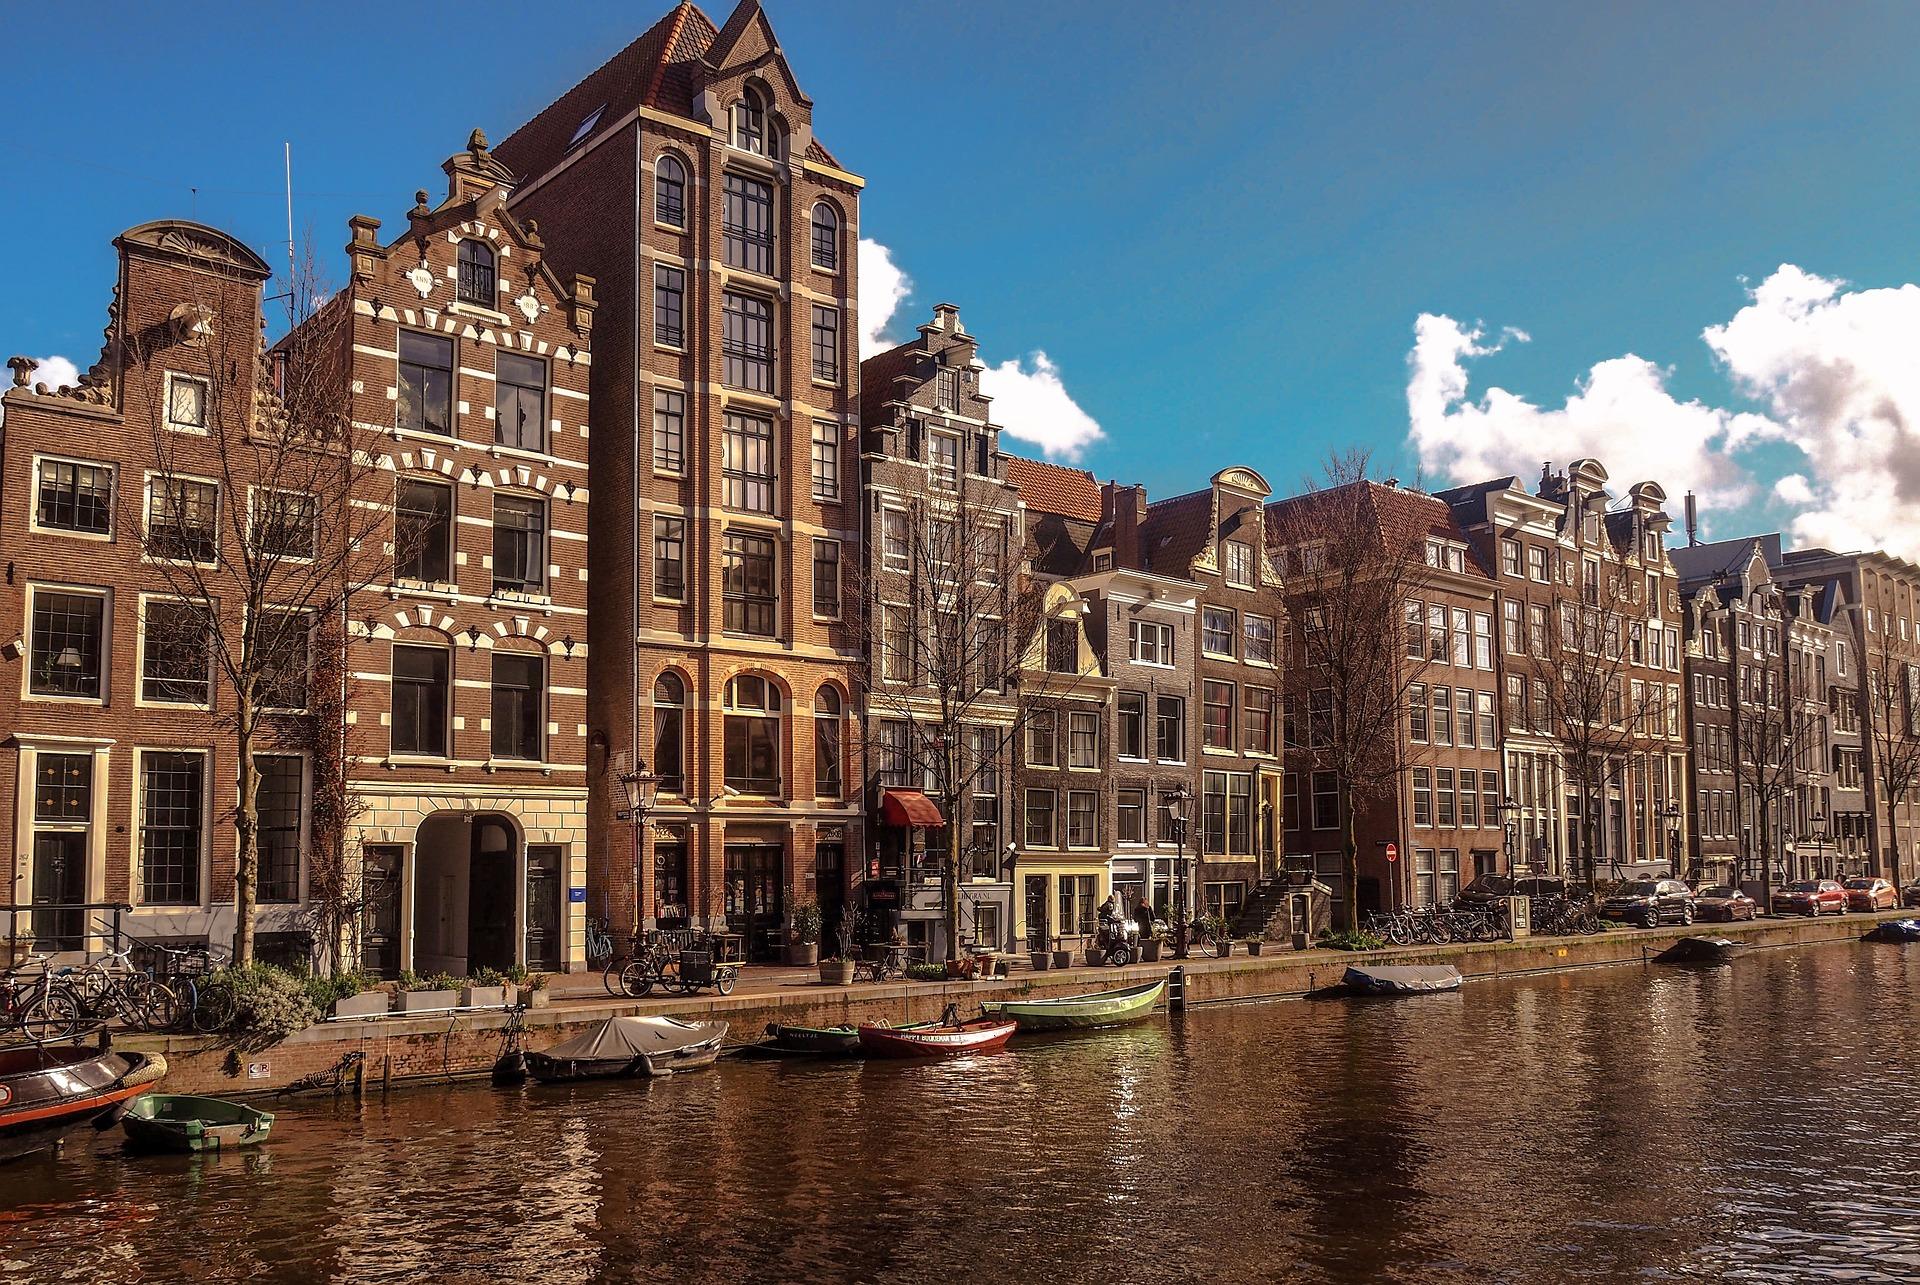 amsterdam-4045137_1920.jpg?1568105946